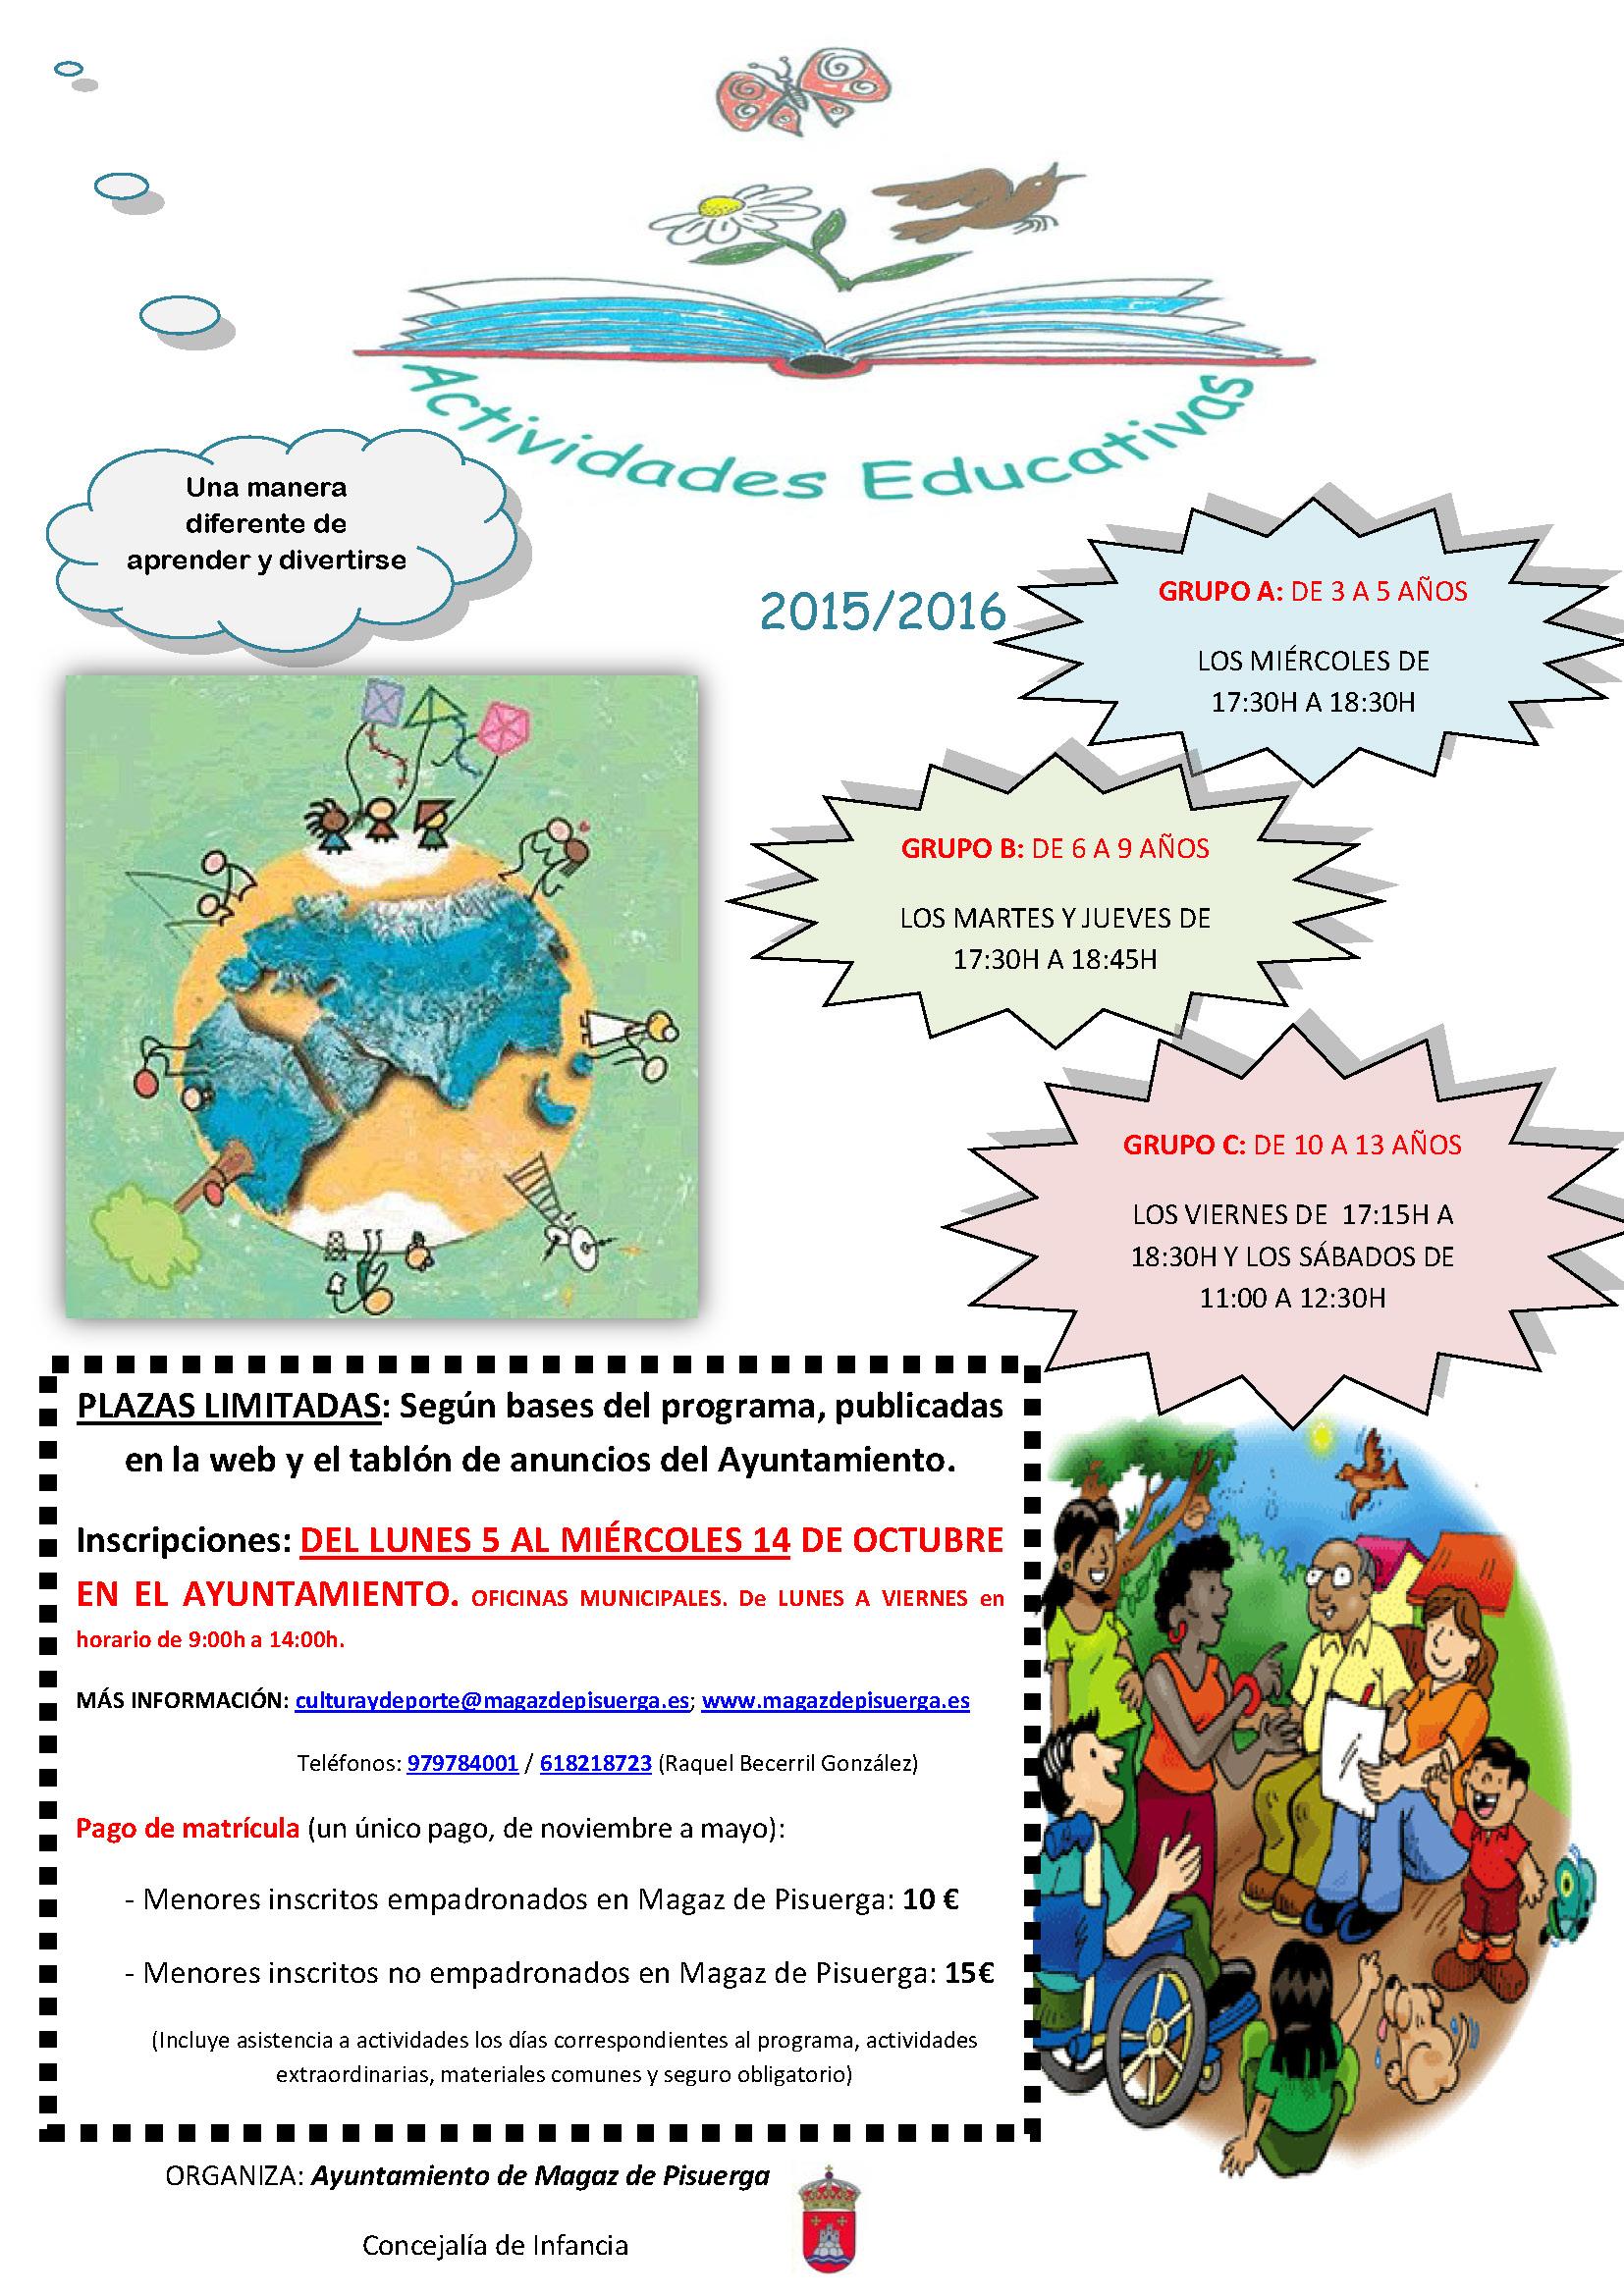 Programa de «Actividades educativas» destinadas a infancia-juventud